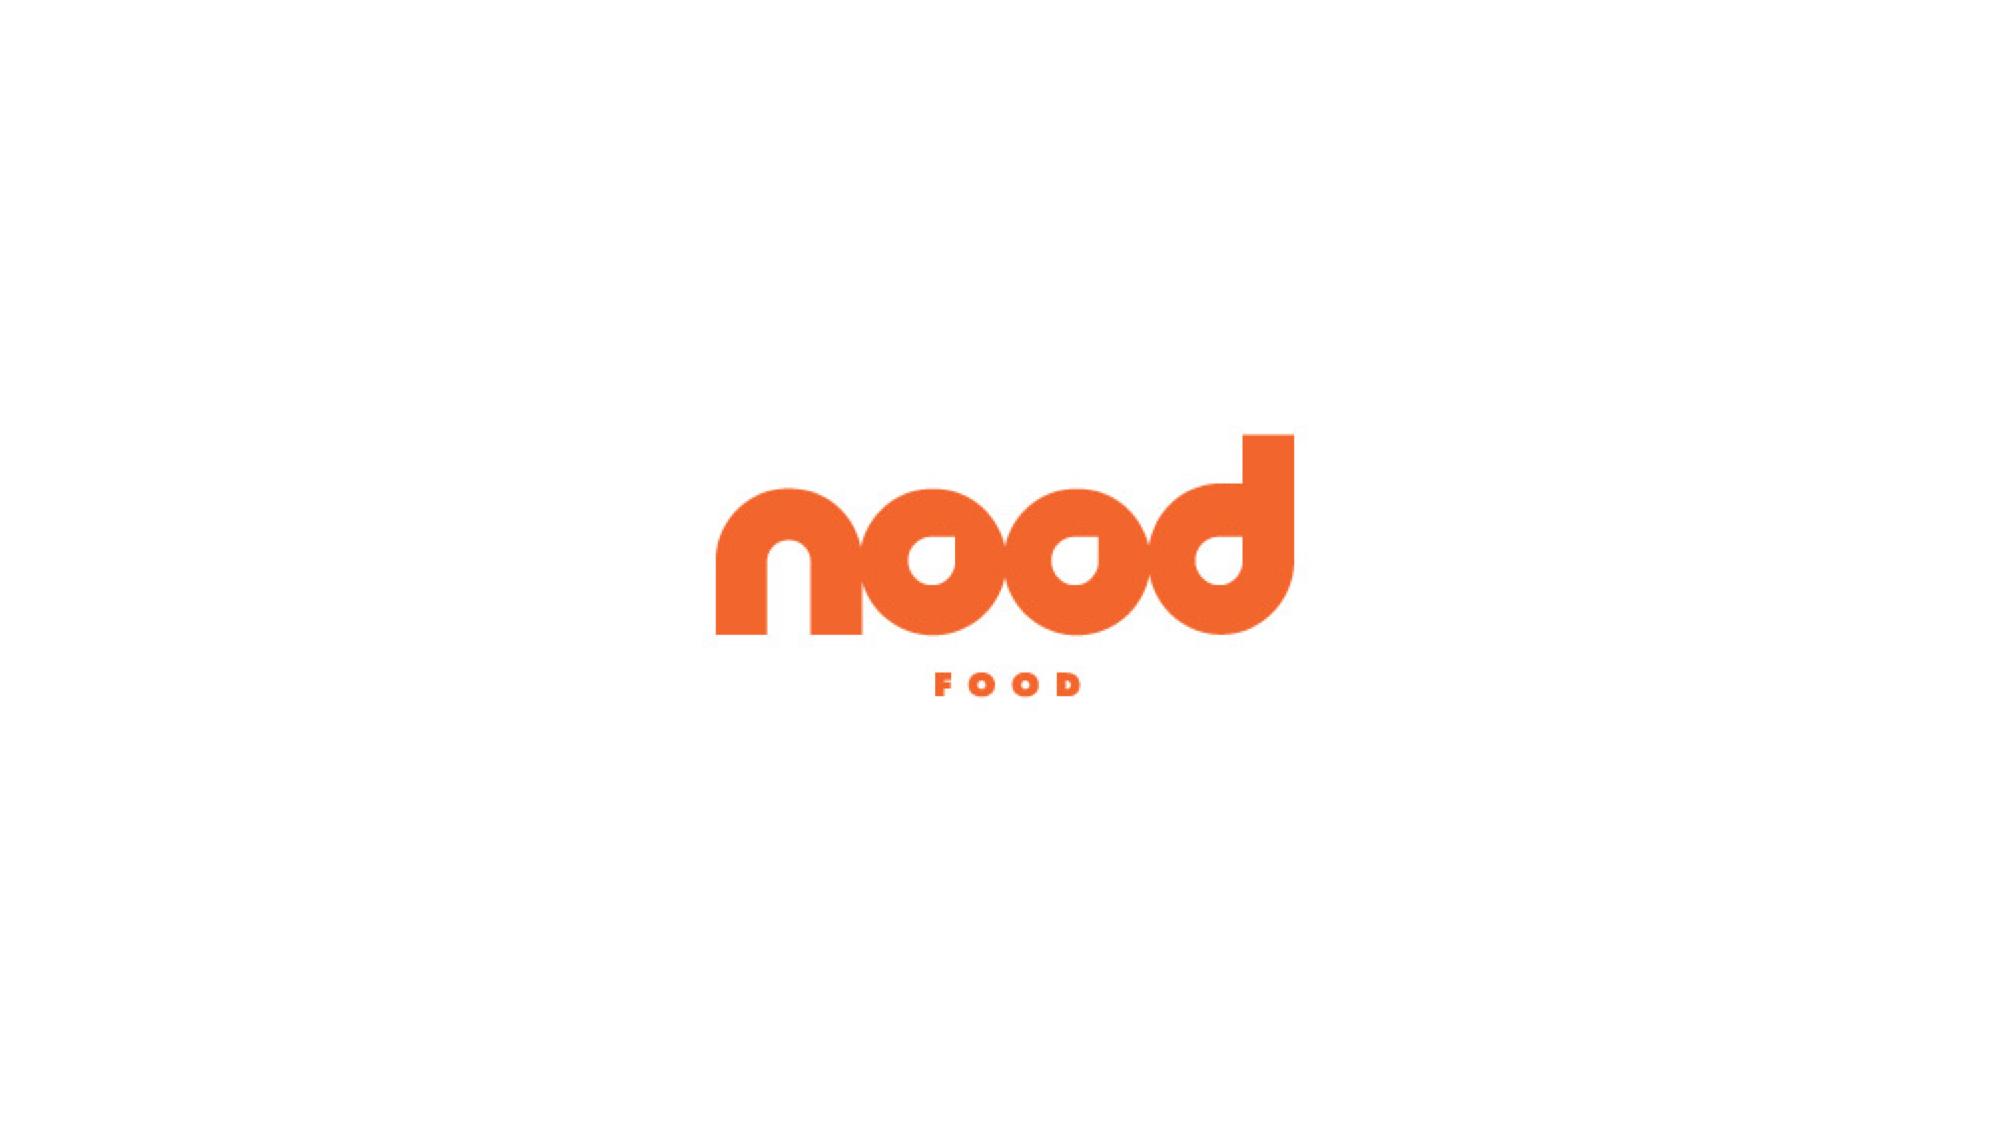 nood food.png